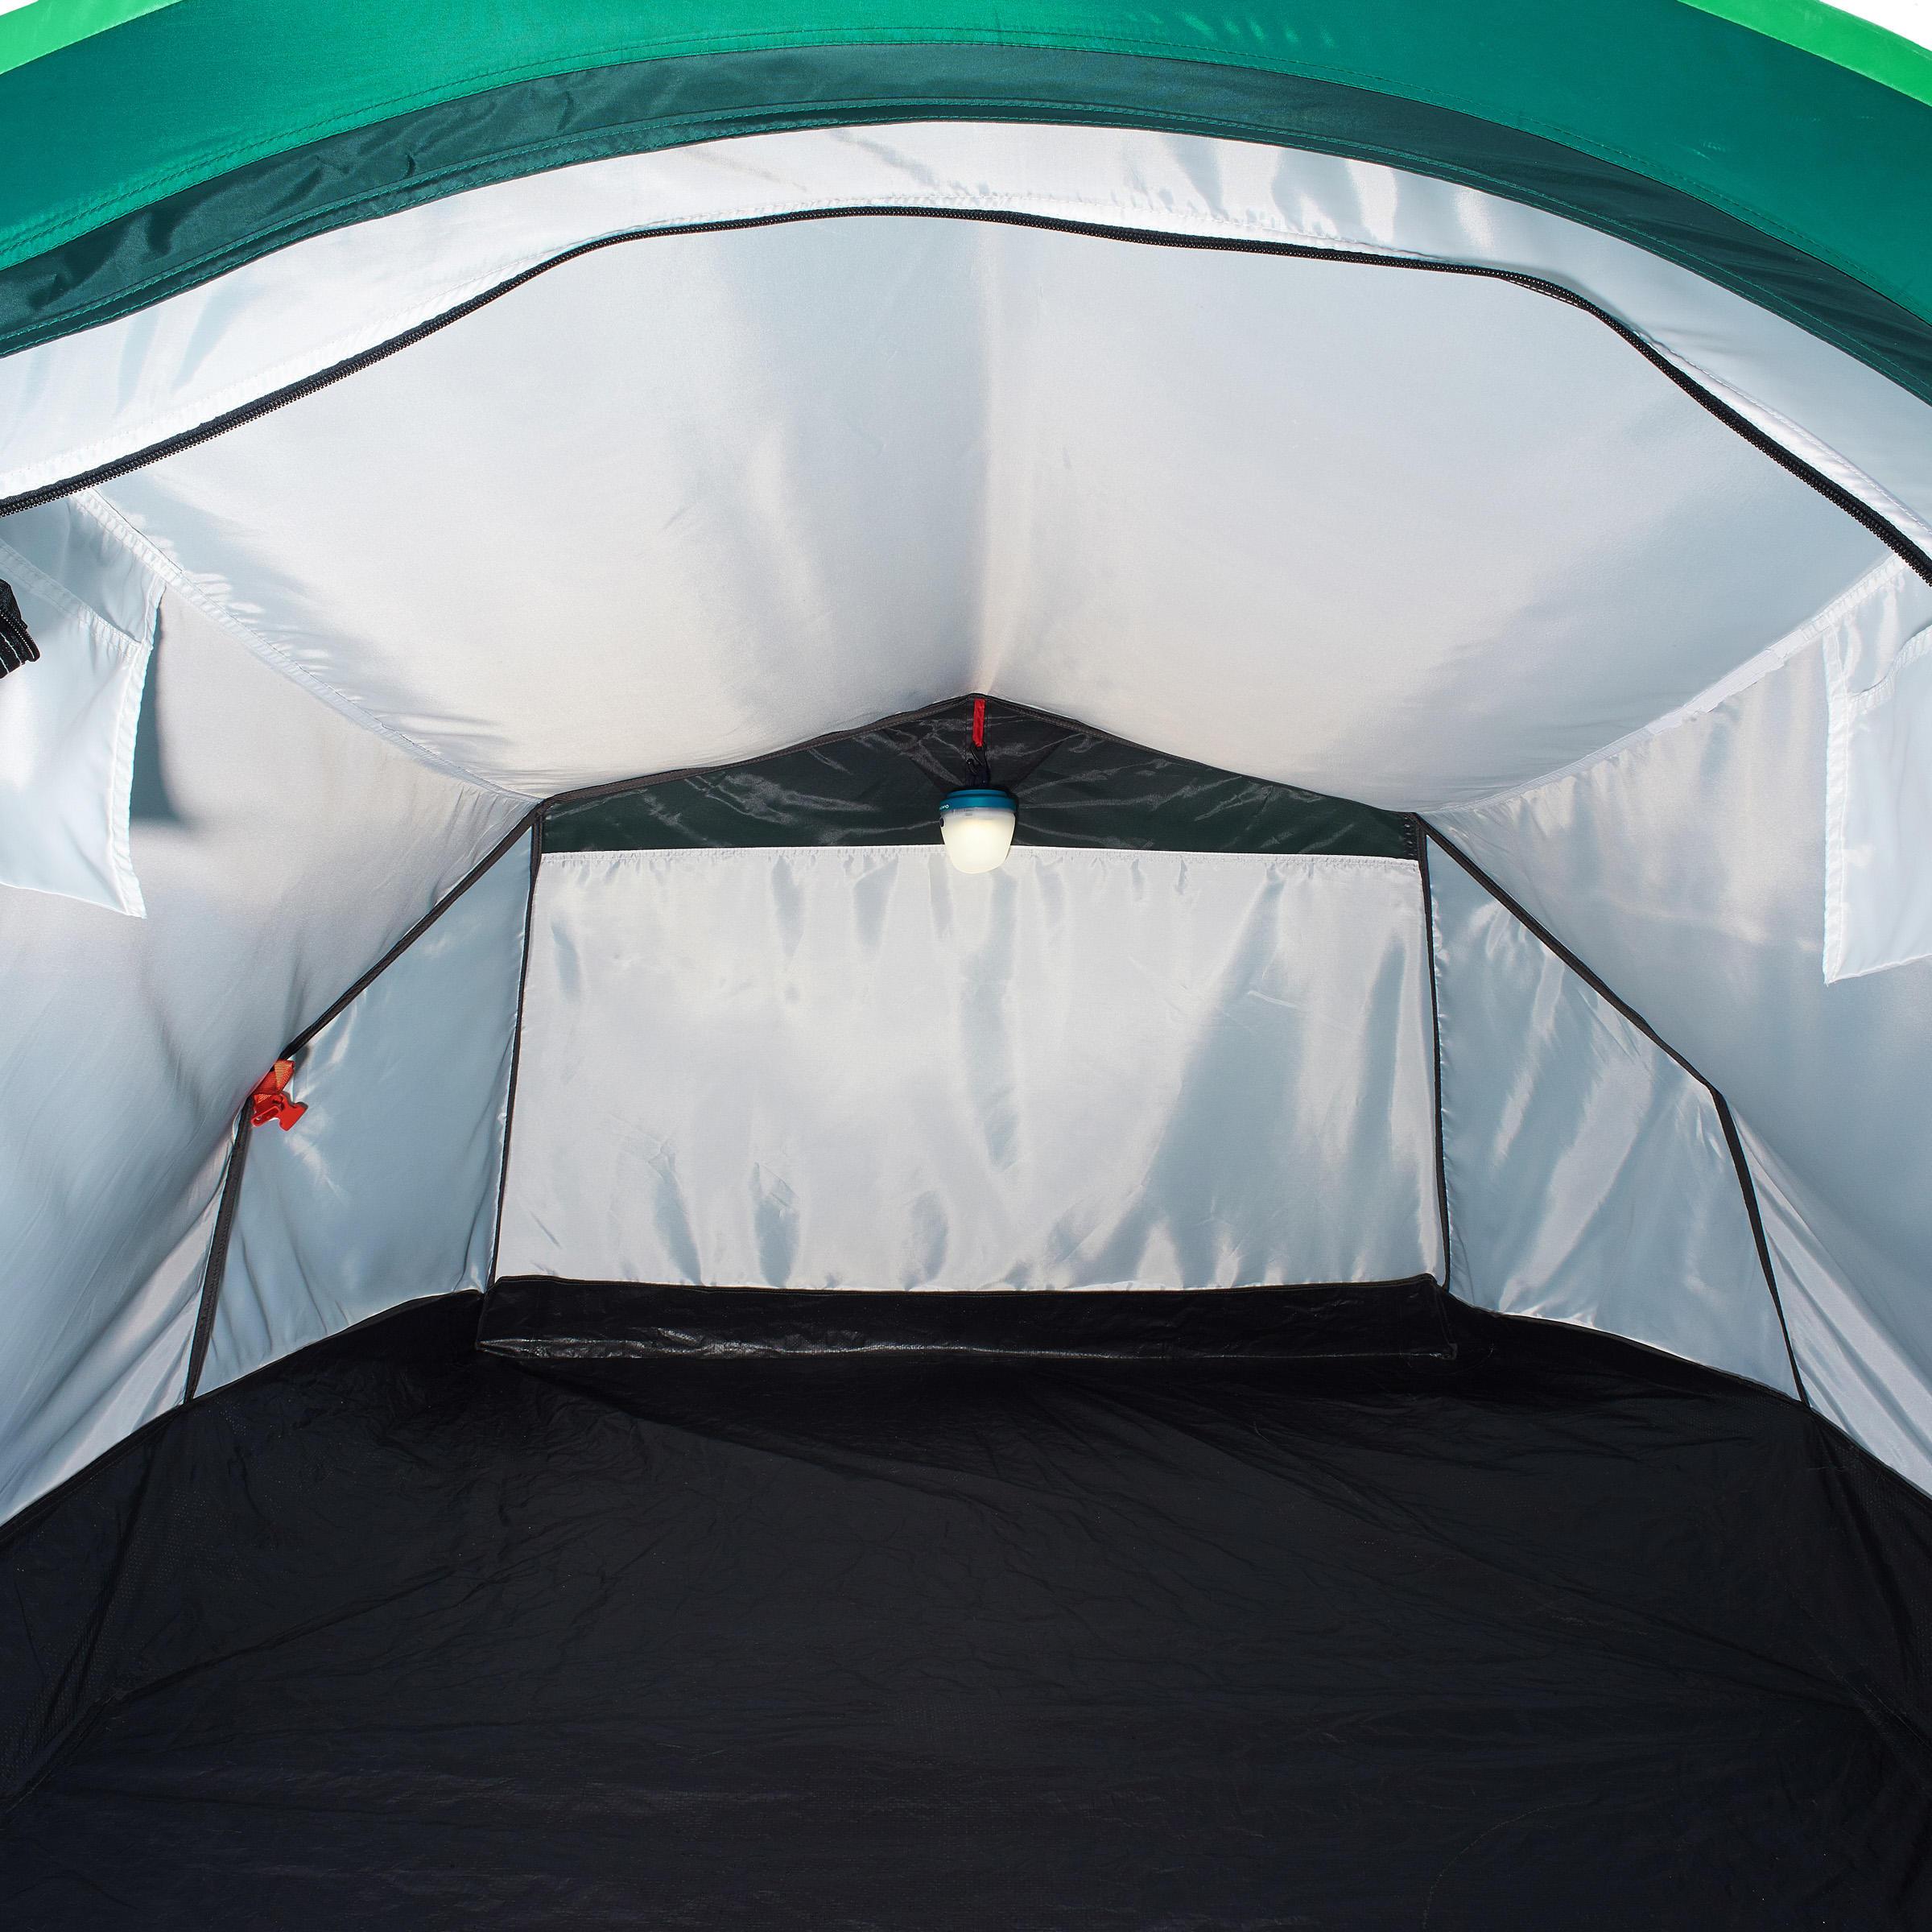 2 Seconds 2-Man Camping Tent - Green